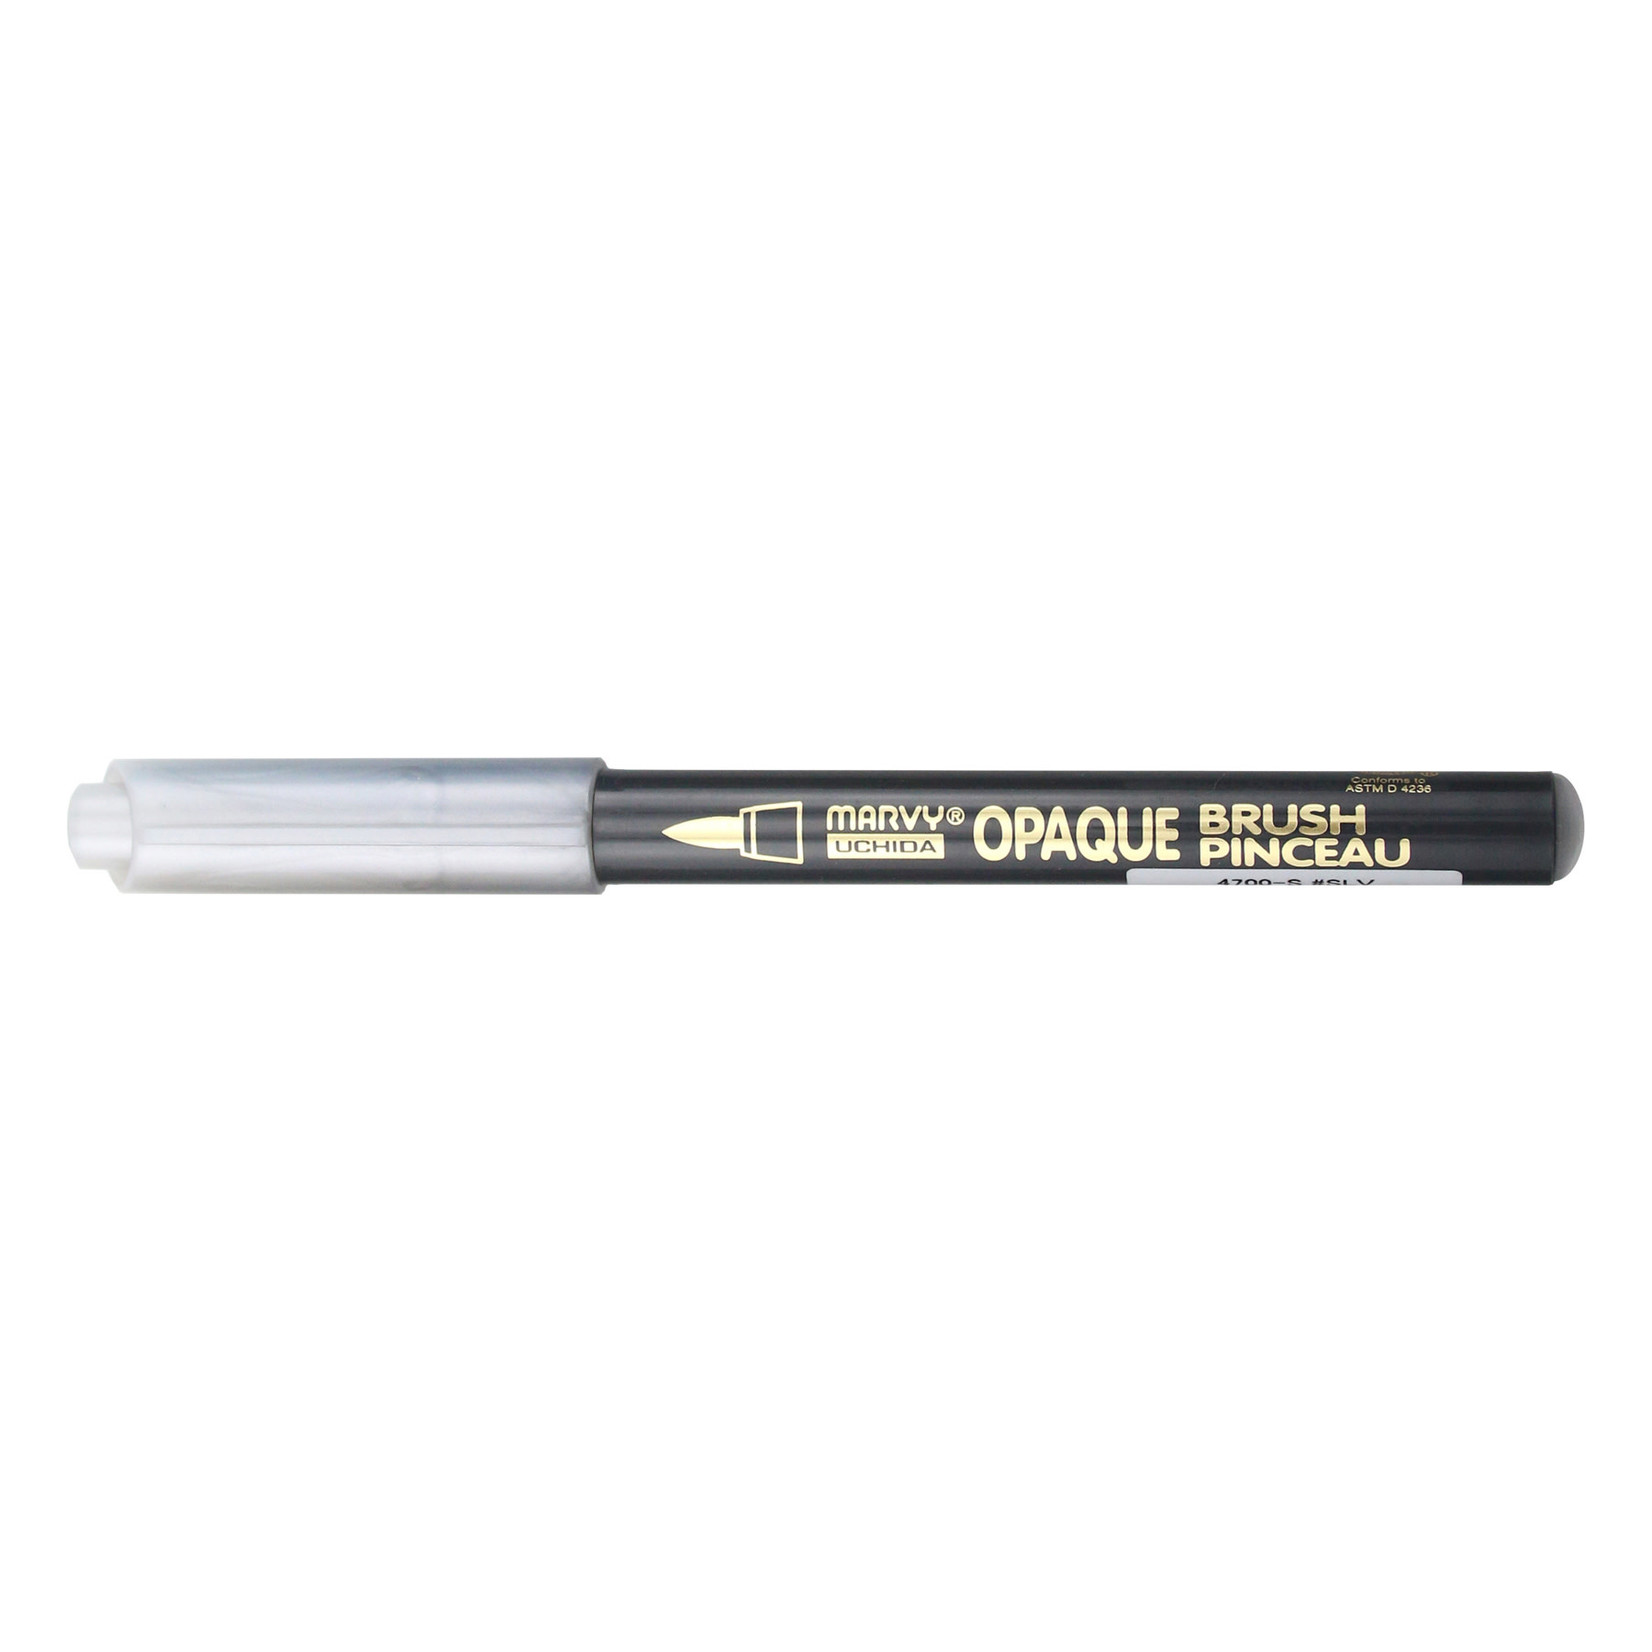 Marvy Uchida Marvy Uchida - Opaque Brush Metallic Colours